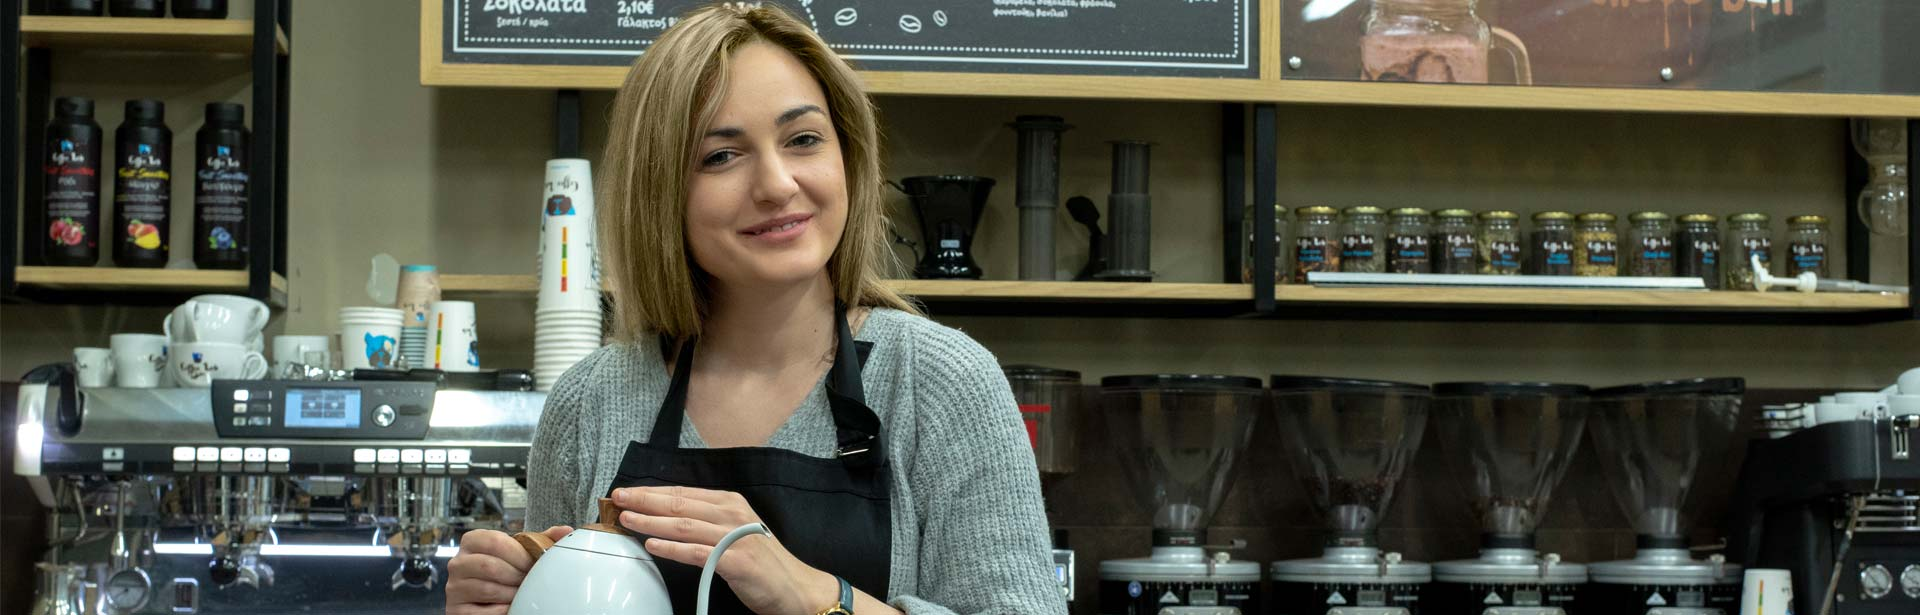 Franchise καφέ coffeelab